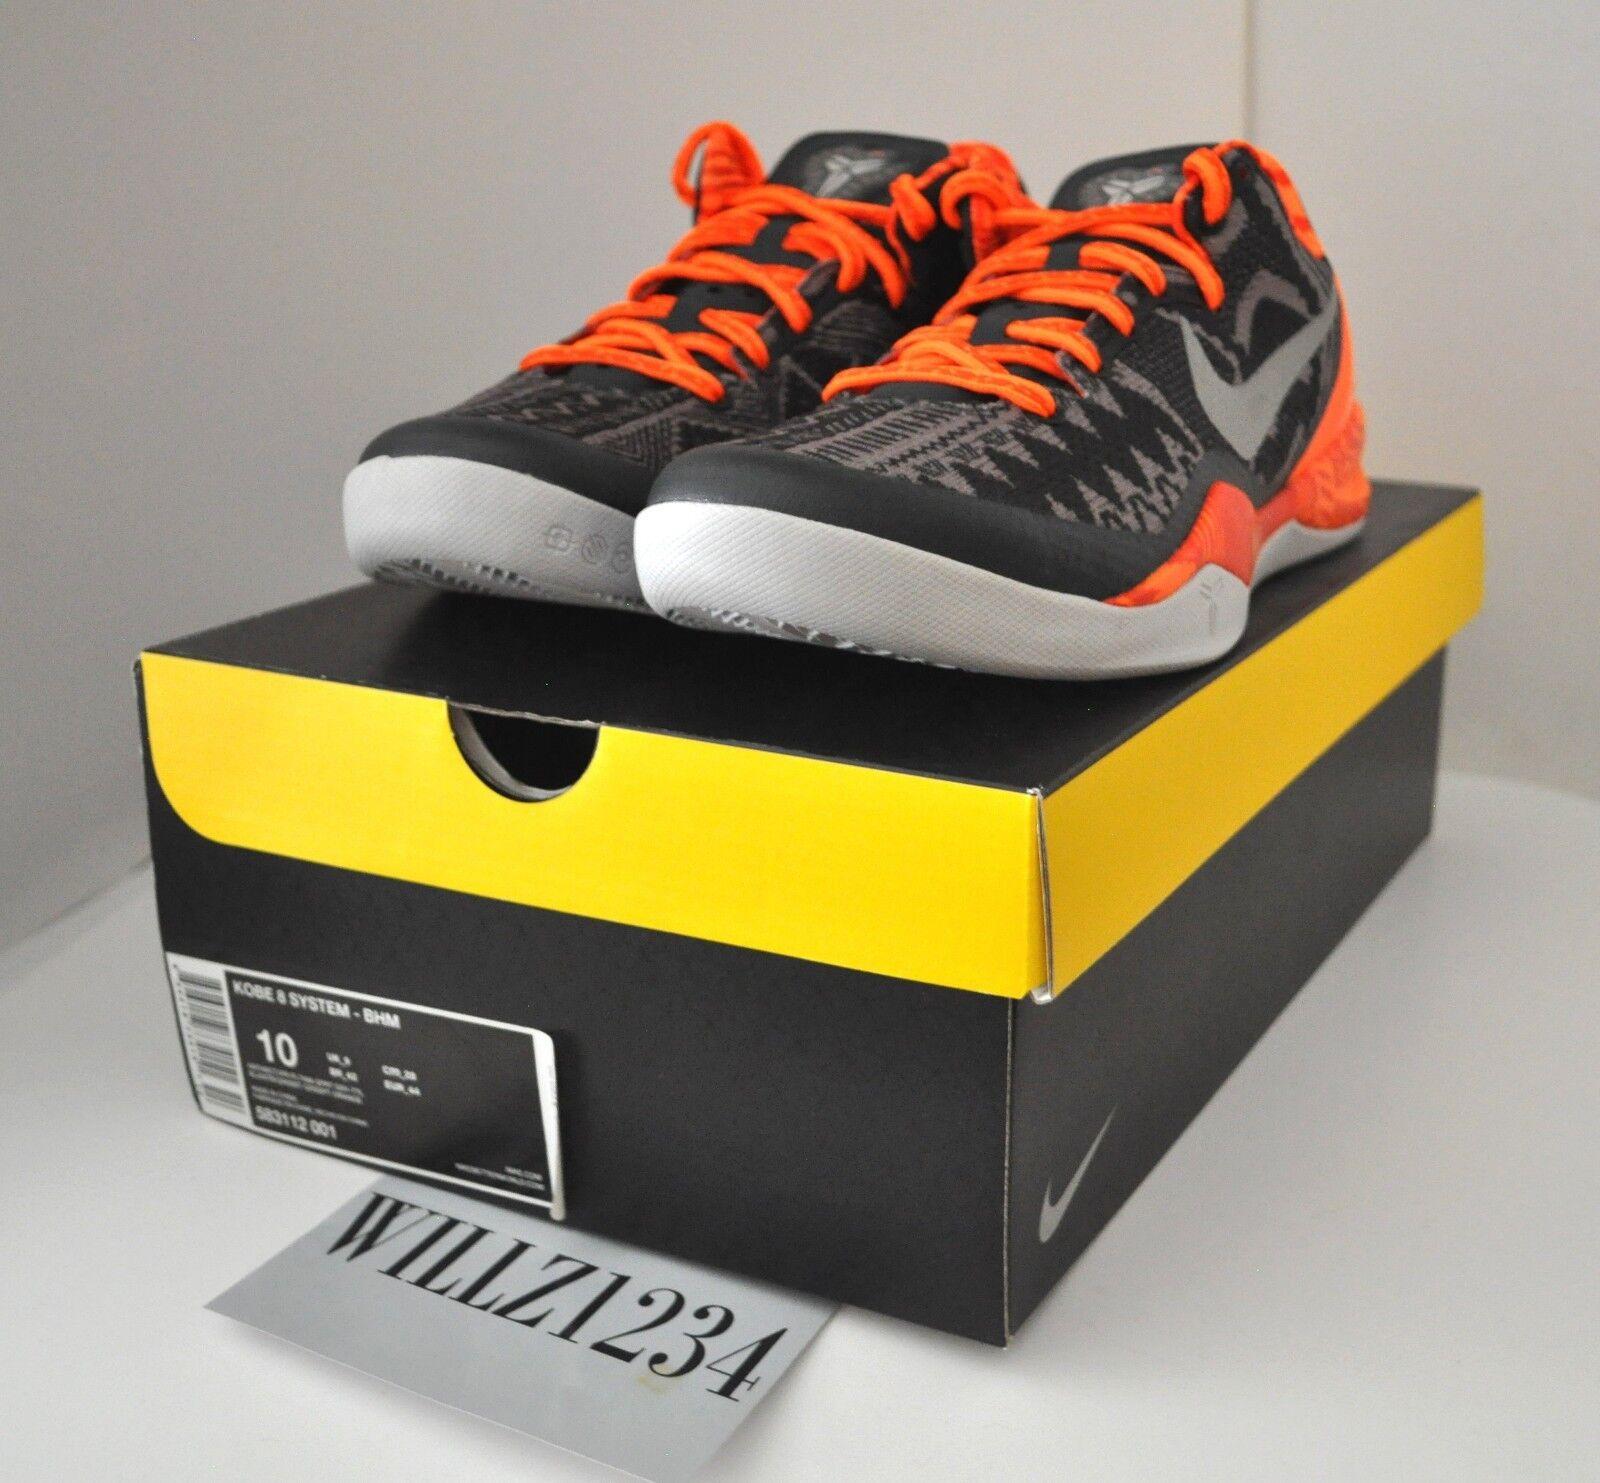 NikeLab NikeLab NikeLab Nike Air Force 1 AF1 Downtown Hi SP x ACRONYM Black Sz 10.5 649941 003 c33c49